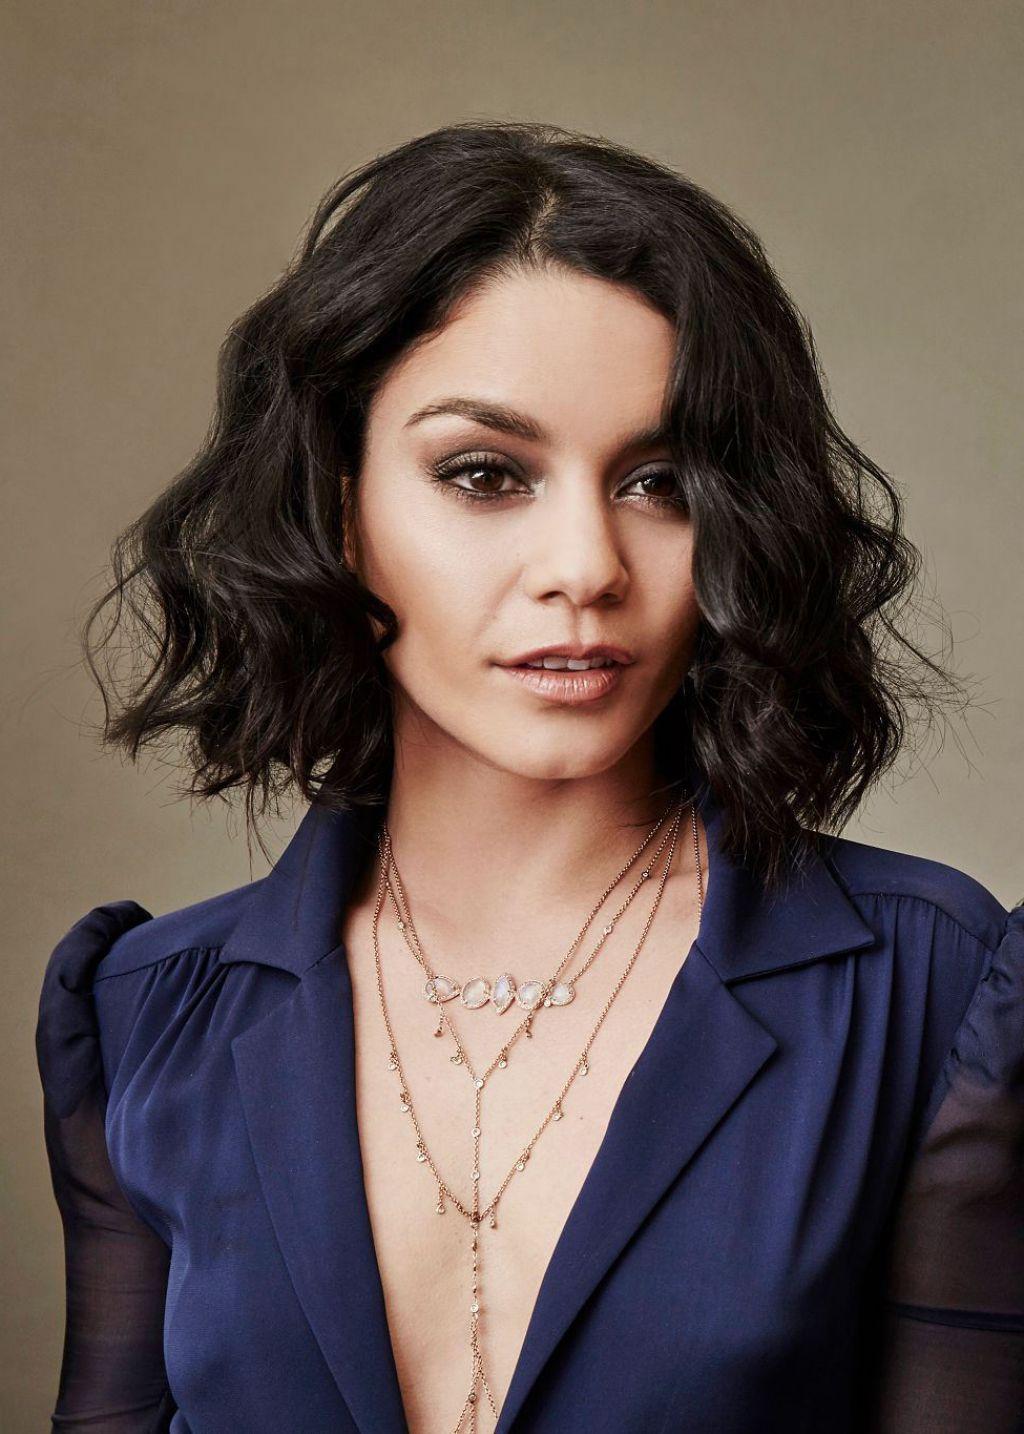 Vanessa Hudgens - Movies, Bio and Lists on MUBI